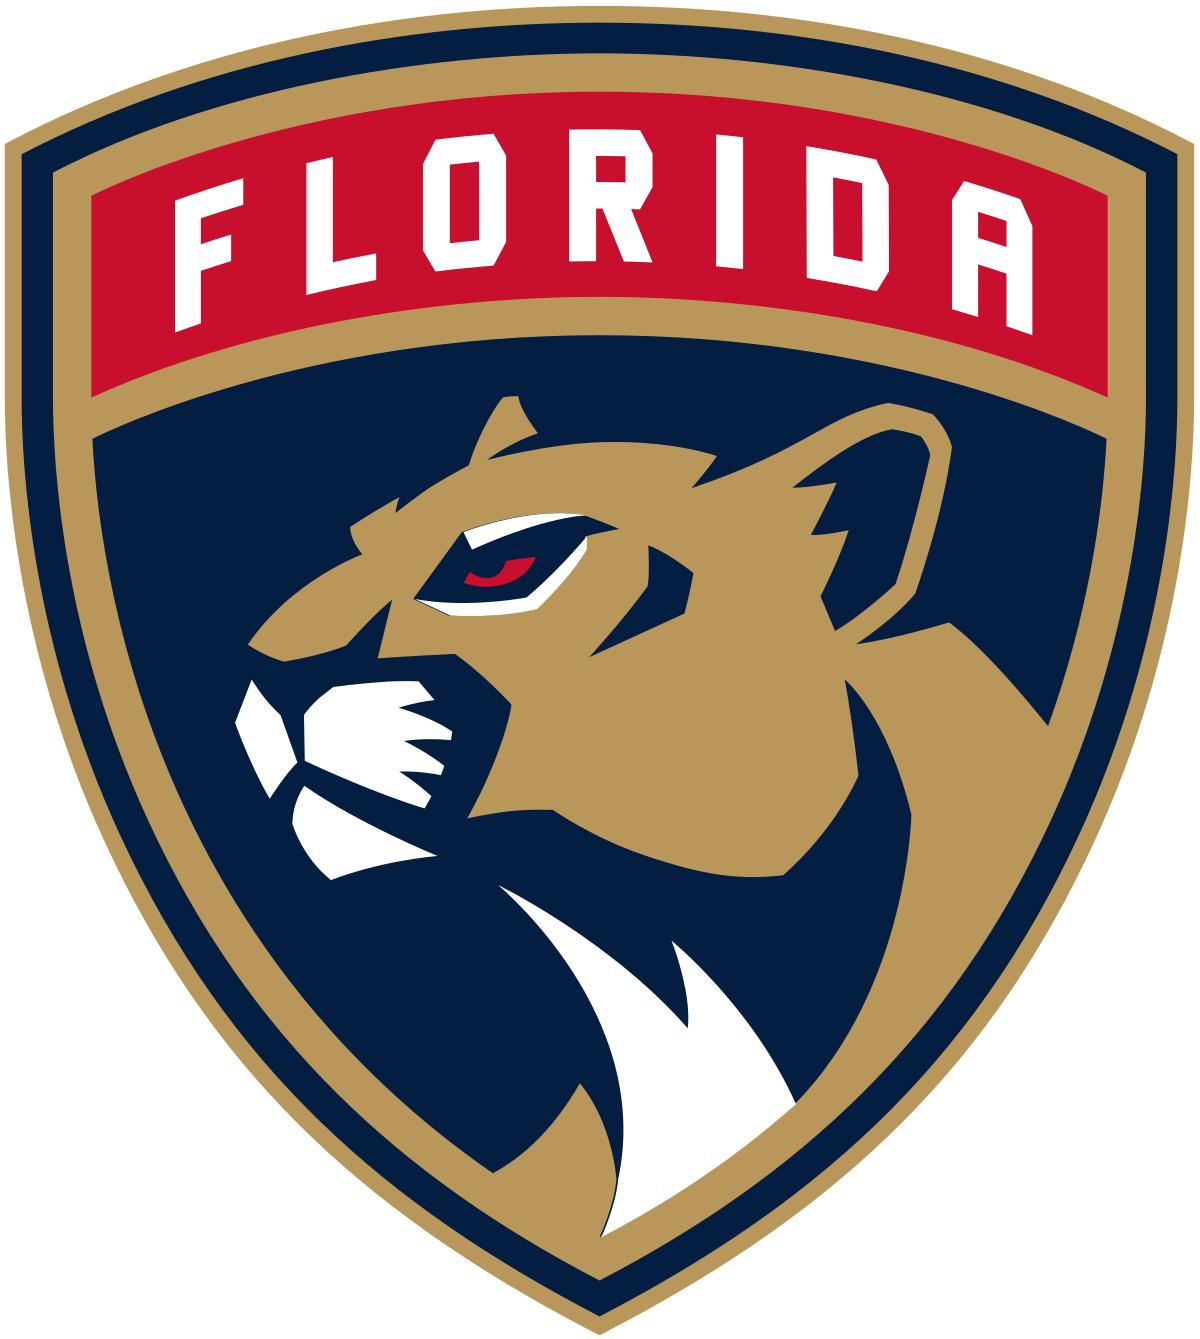 Panther clipart track. Florida logos panthers wikipedia